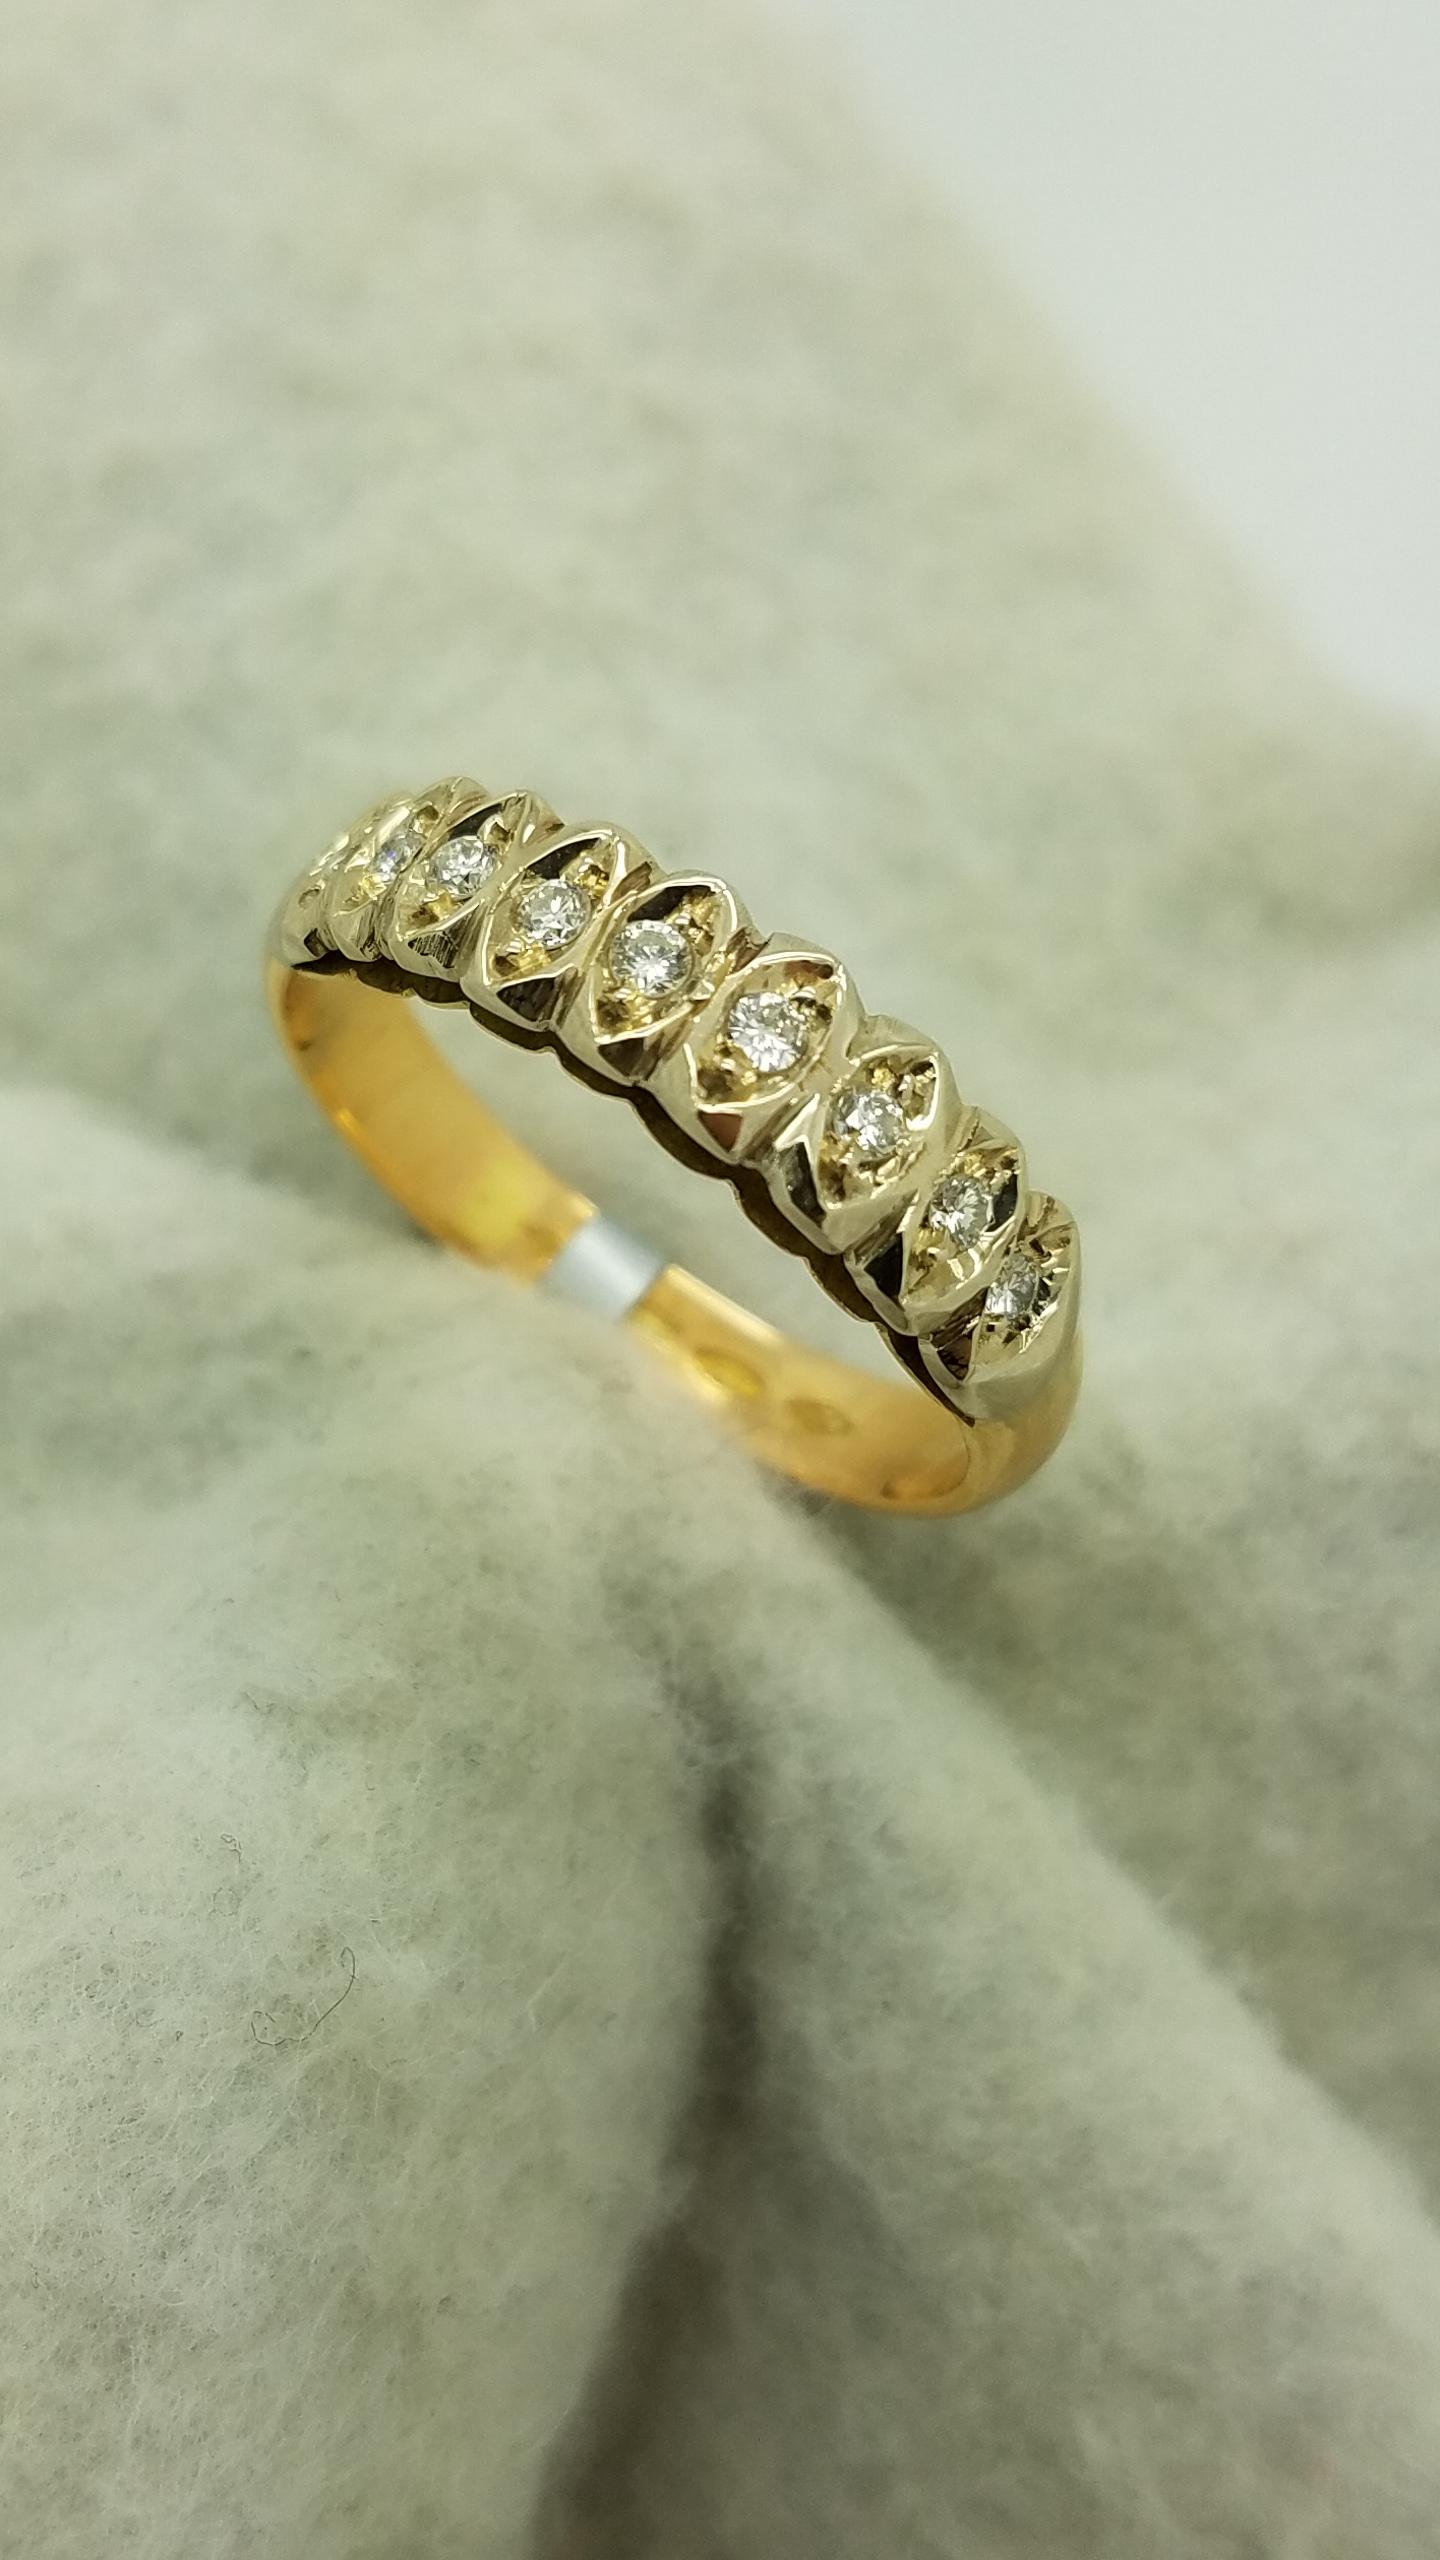 18KYellow GoldHand Made0.20ctRoundCutDiamondAnniversary Bandwedding-ring